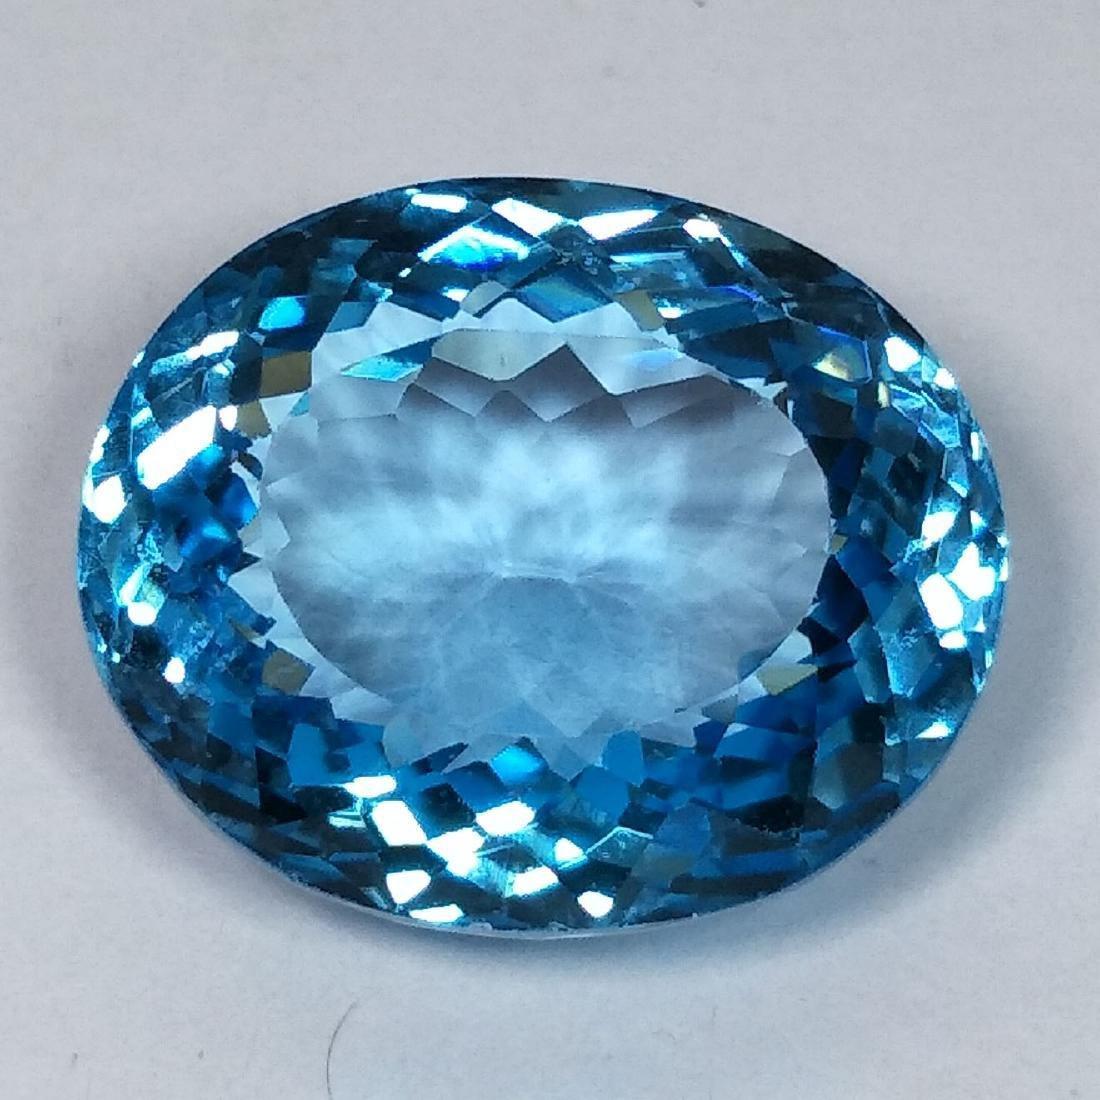 31.09 Carat Loose Swiss Blue Topaz